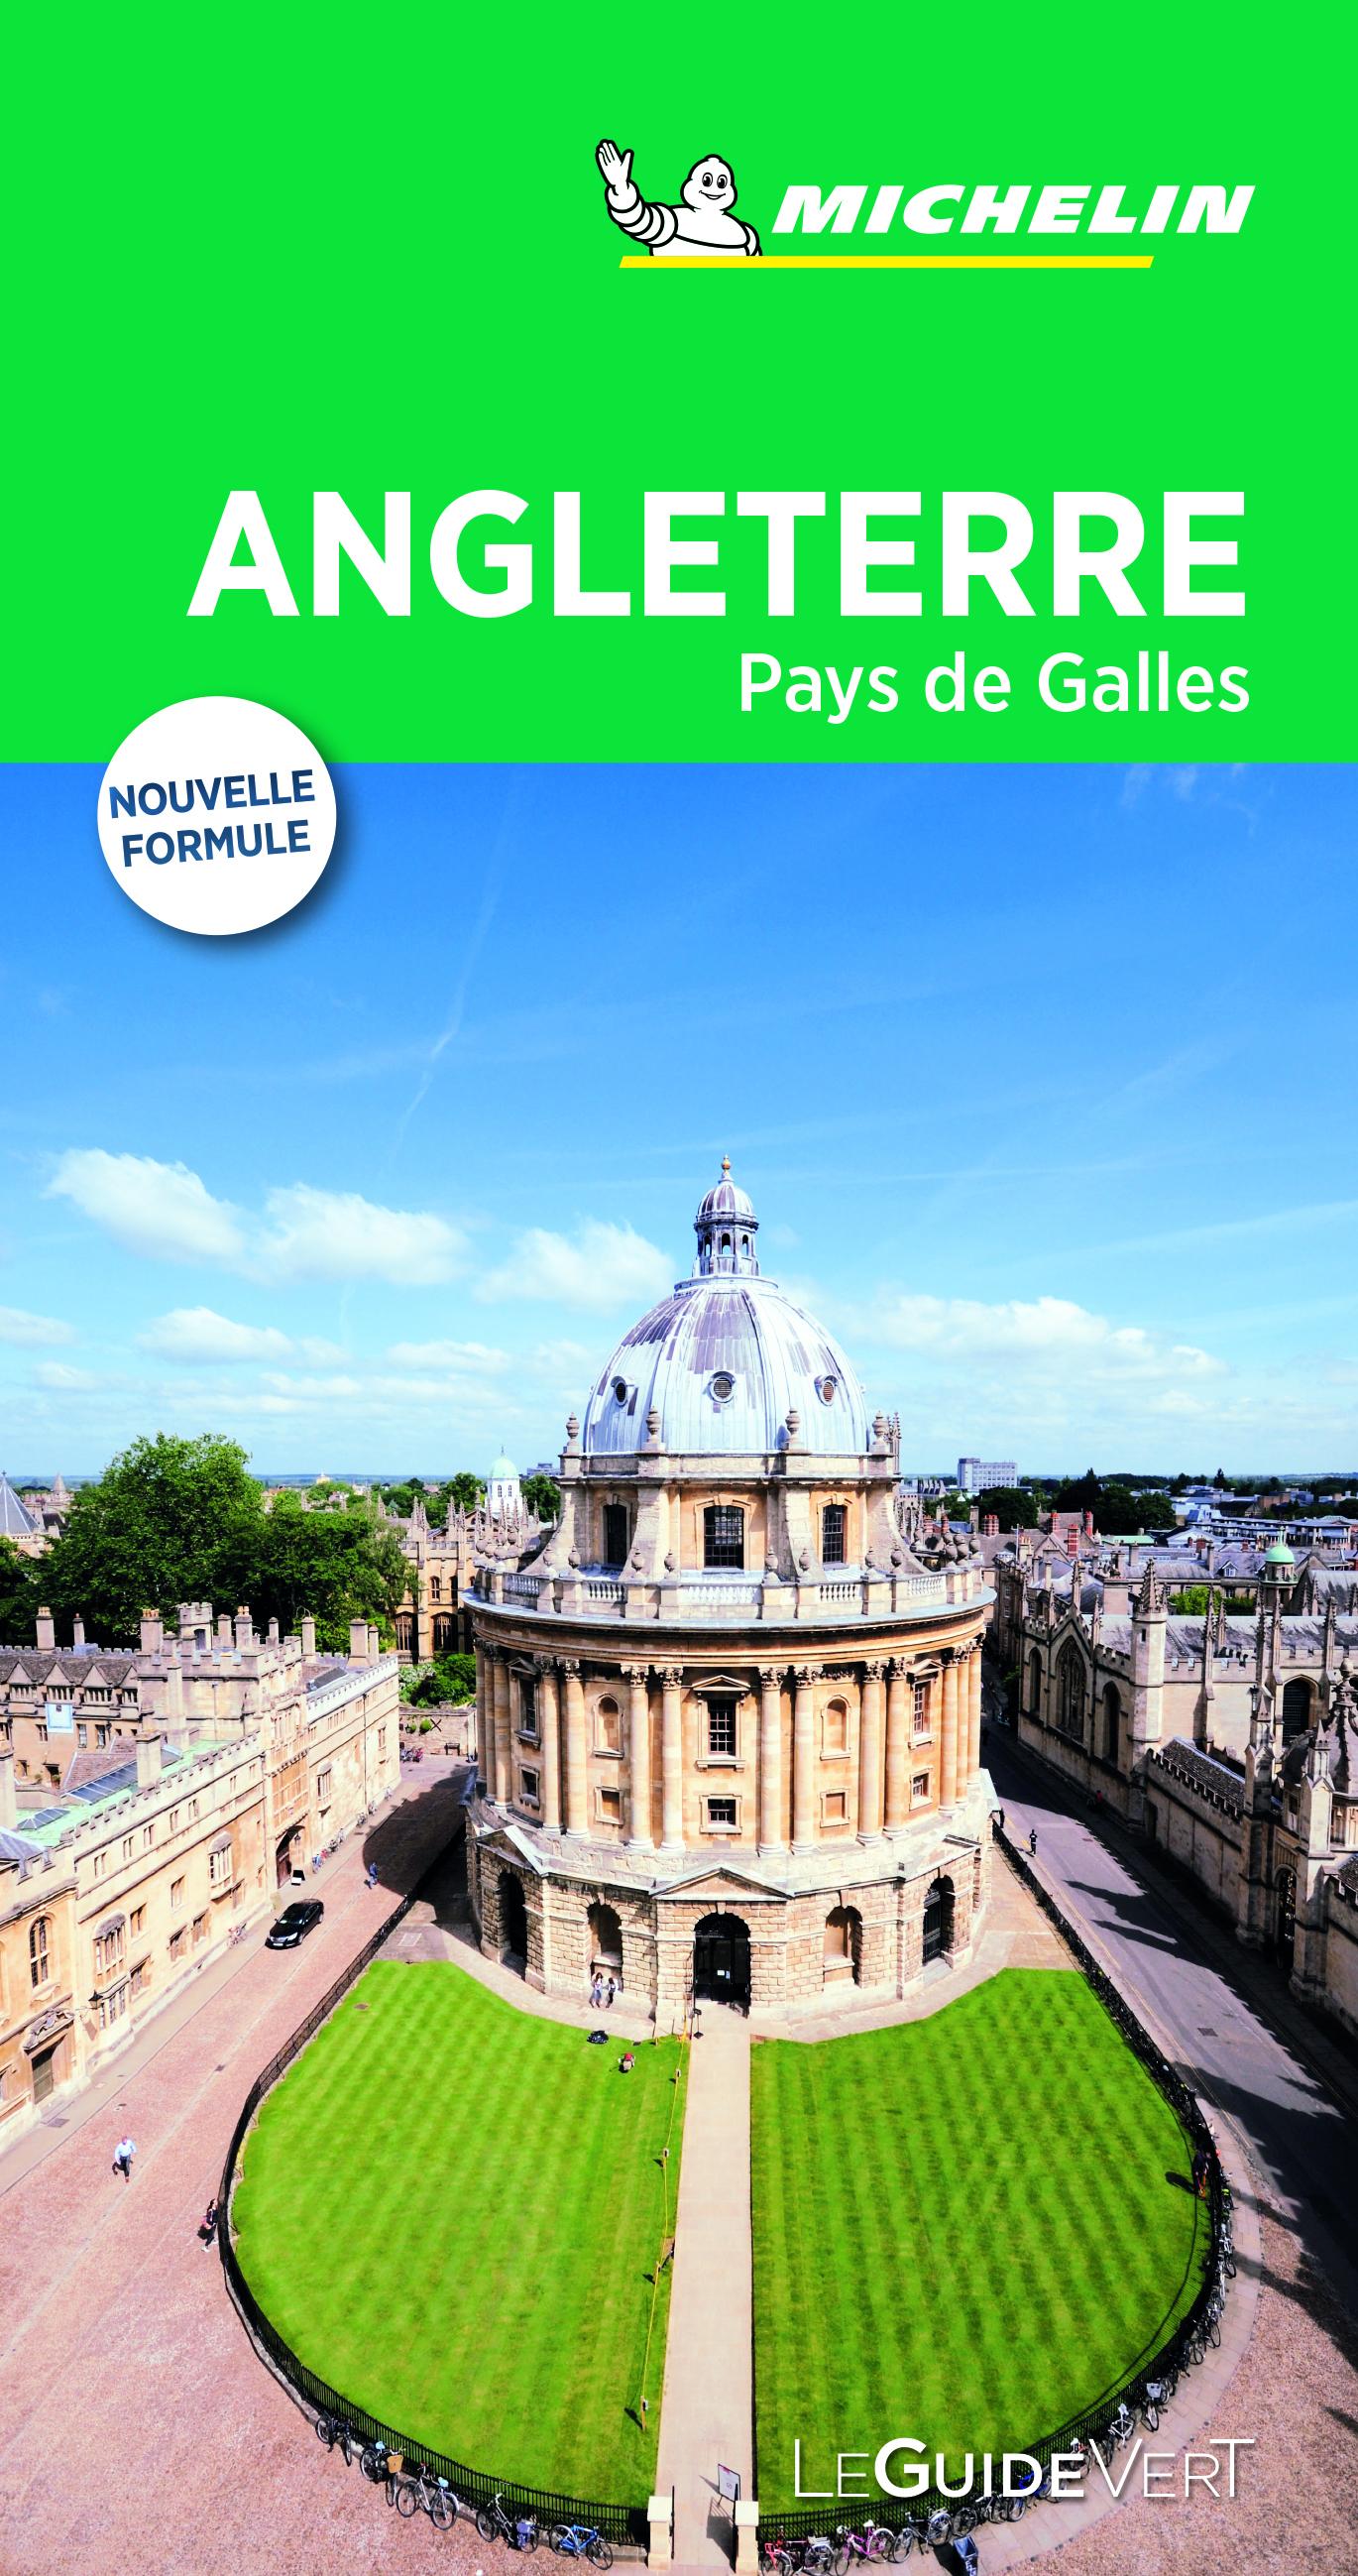 GUIDE VERT ANGLETERRE PAYS DE GALLES